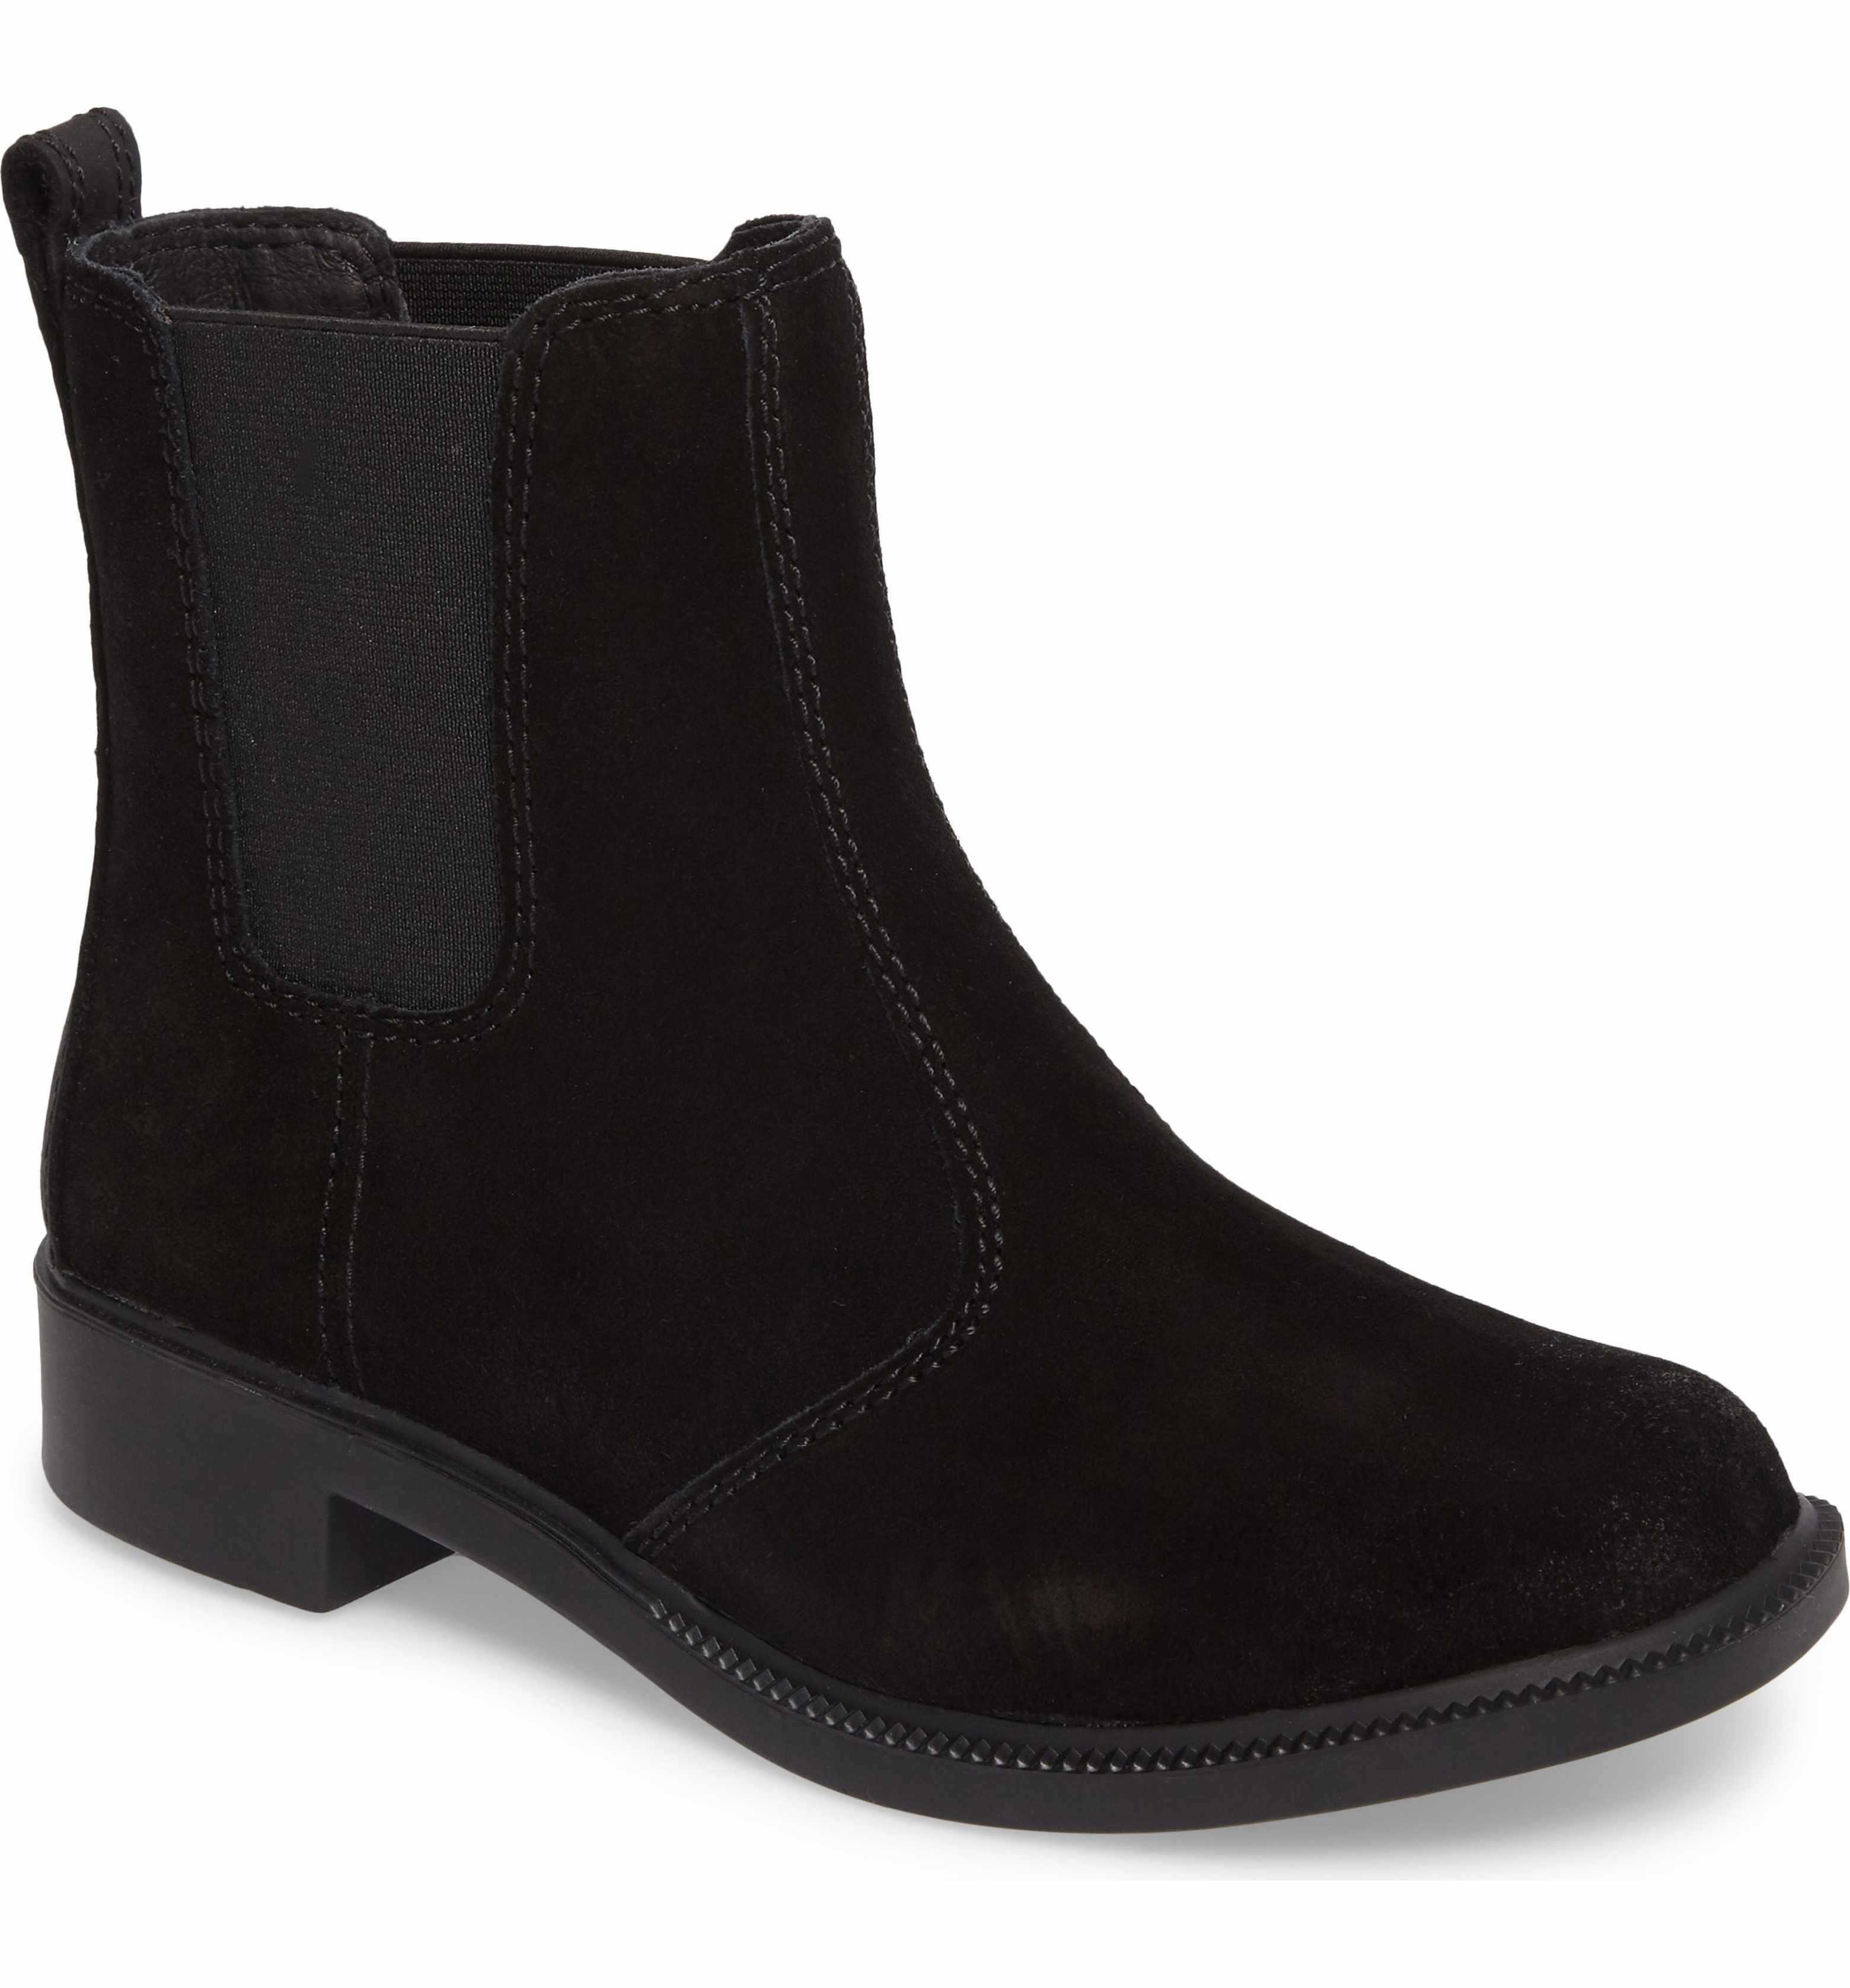 Kodiak Bria Waterproof Chelsea Boot (Women) LbaX8g41k